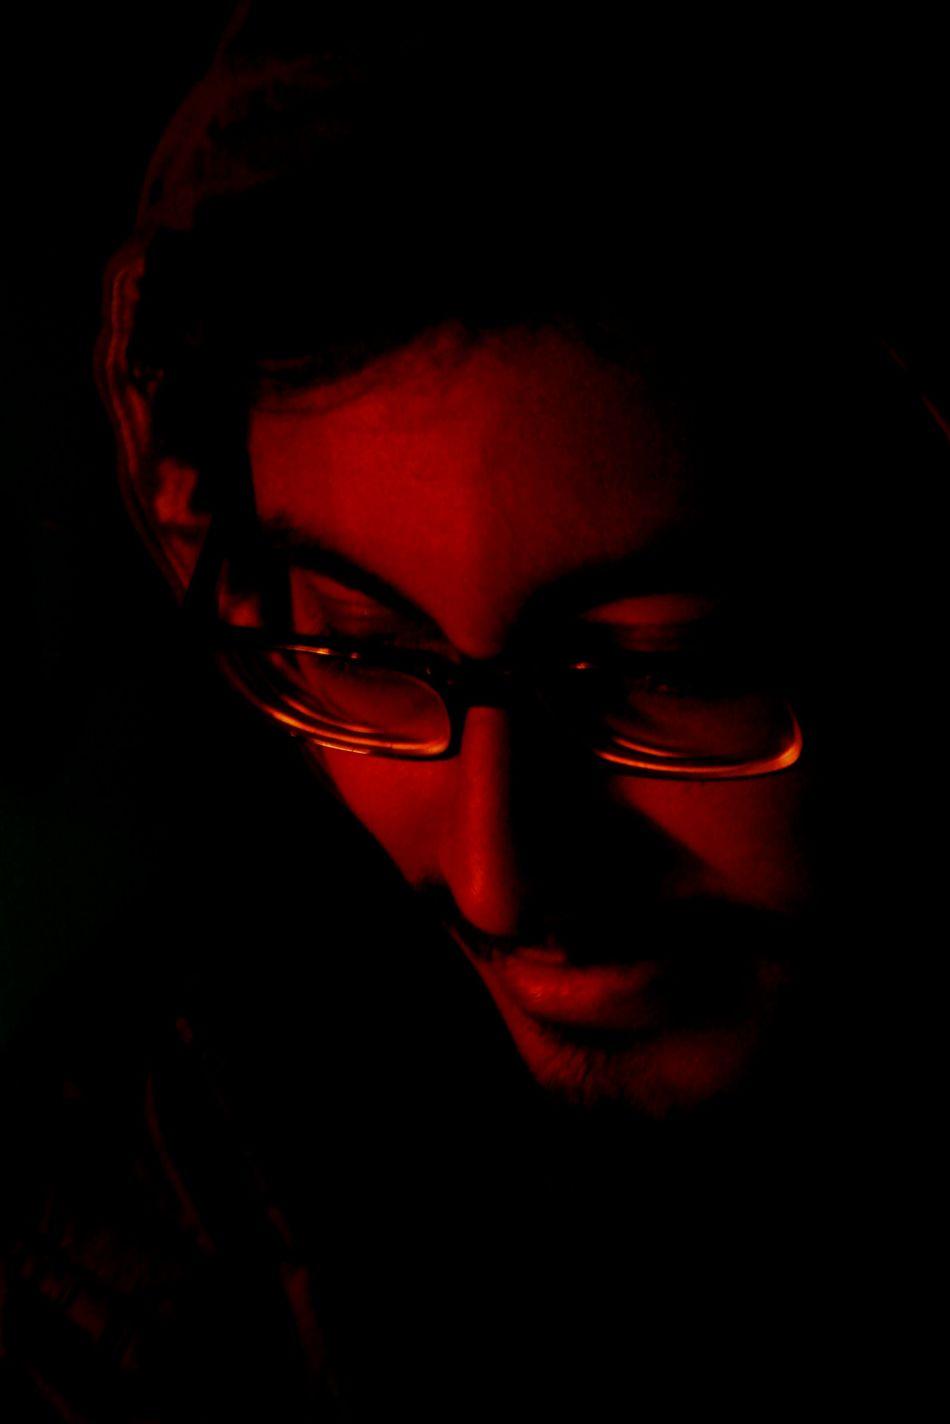 Potrait Midnight On Candle Light Glass First Eyeem Photo